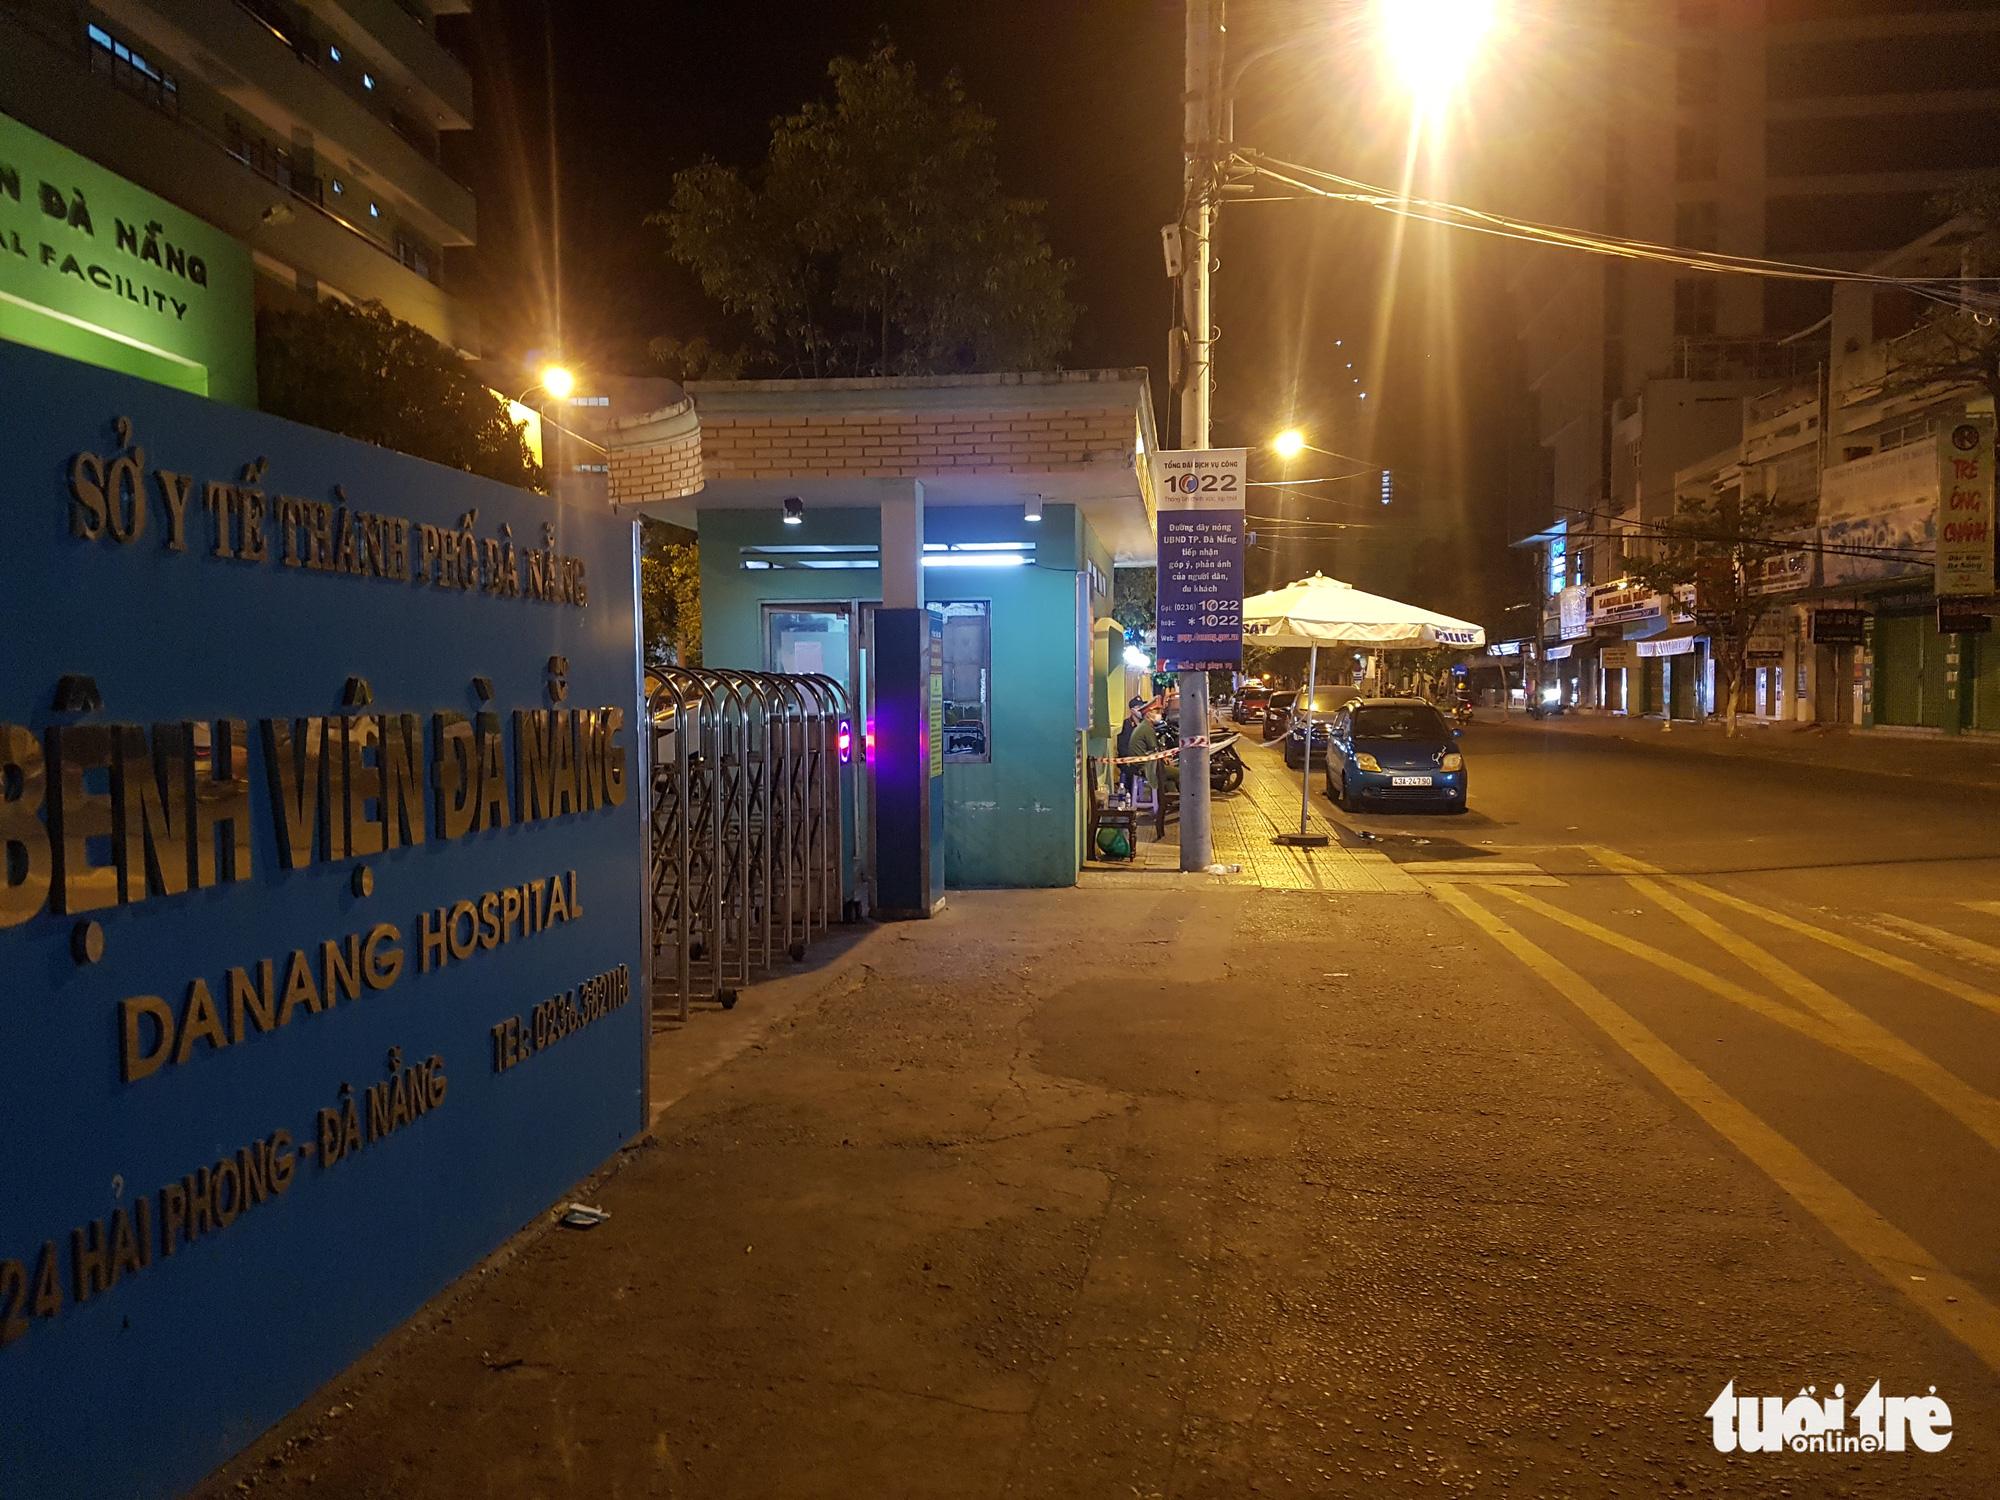 Da Nang Hospital is on lockdown in Da Nang City, Vietnam, July 28, 2020. Photo: Tan Luc / Tuoi Tre